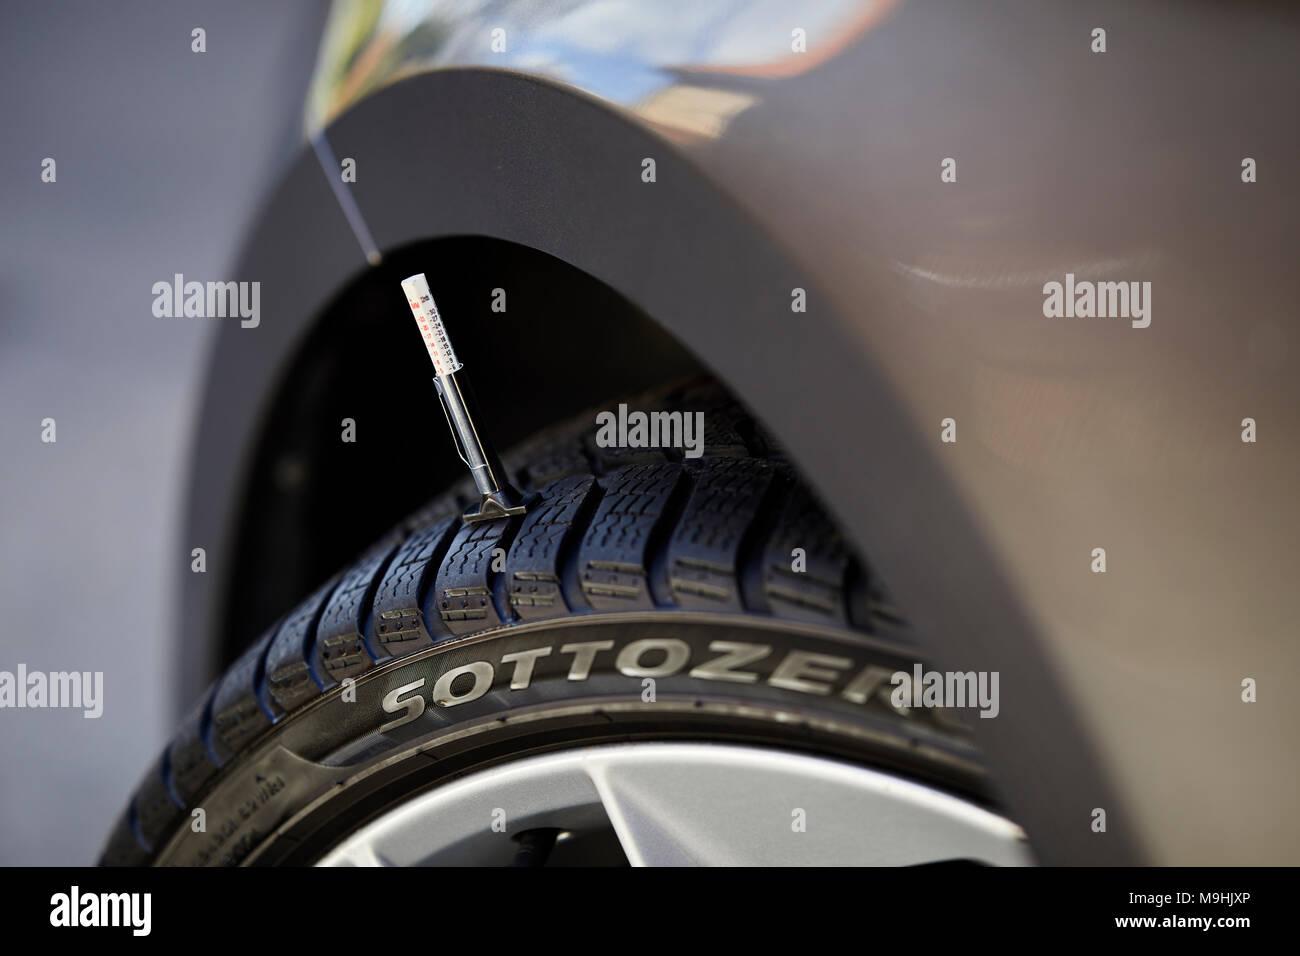 Taking tyre tread depth gauge readings - Stock Image